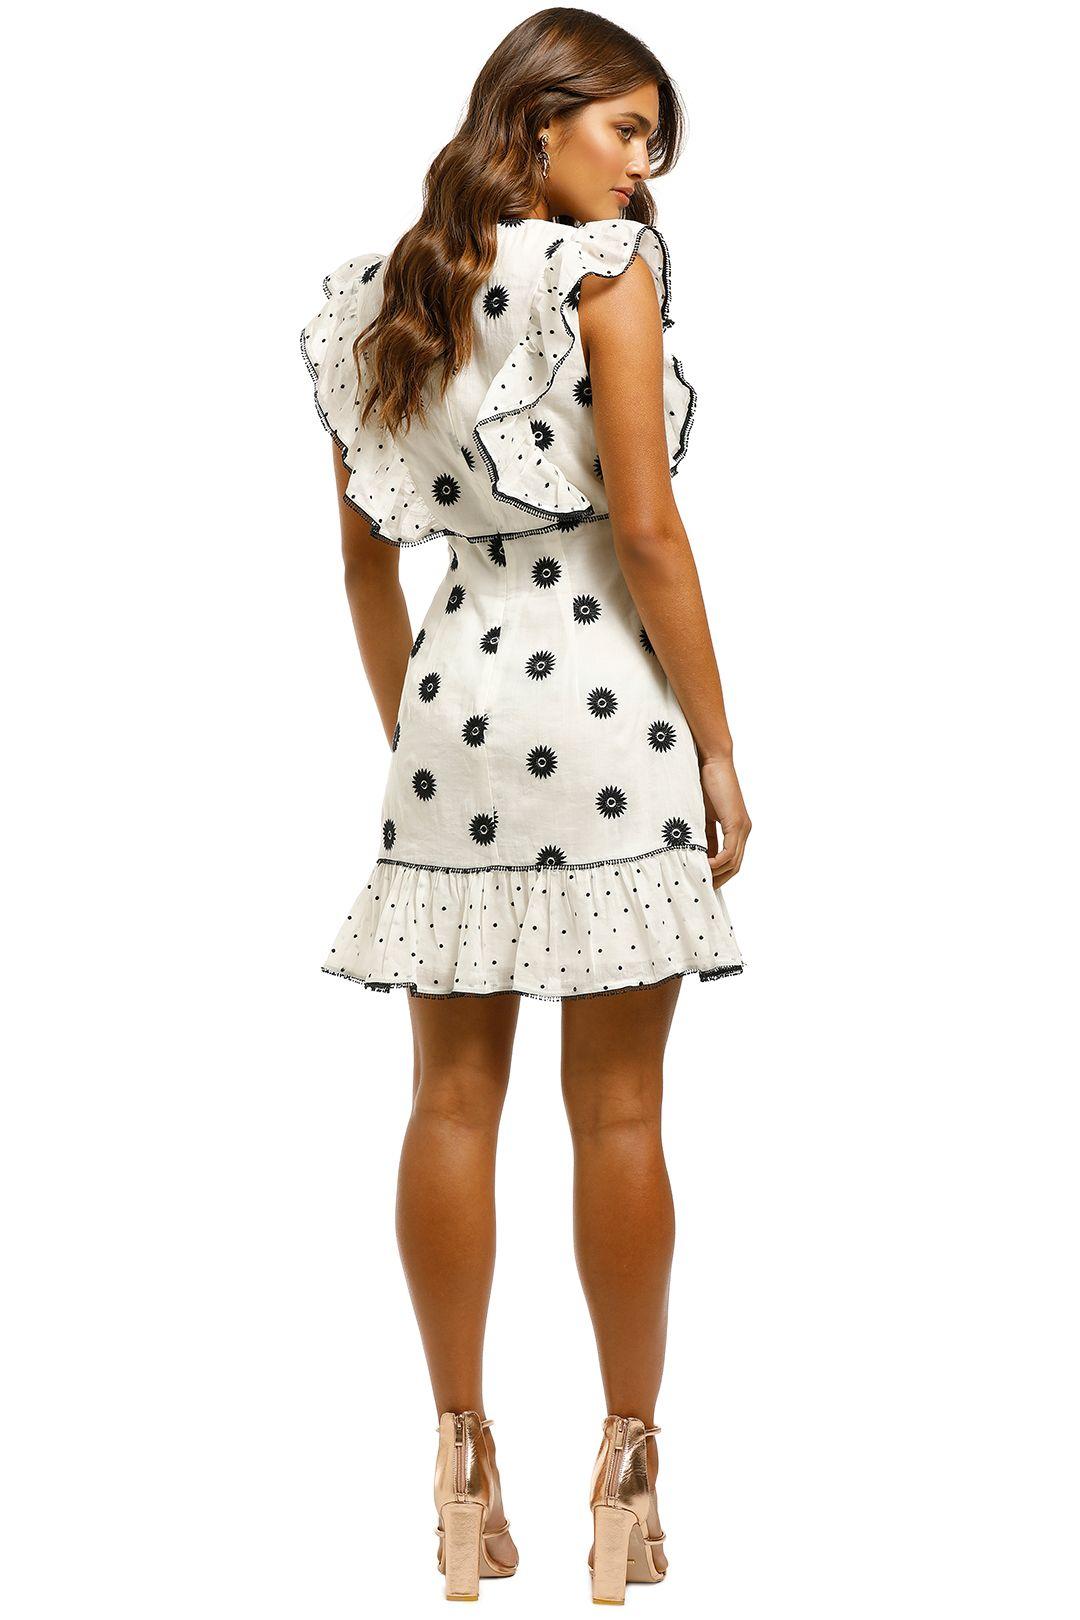 Talulah-Whimsical-Mini-Dress-Morning-Daisy-Back